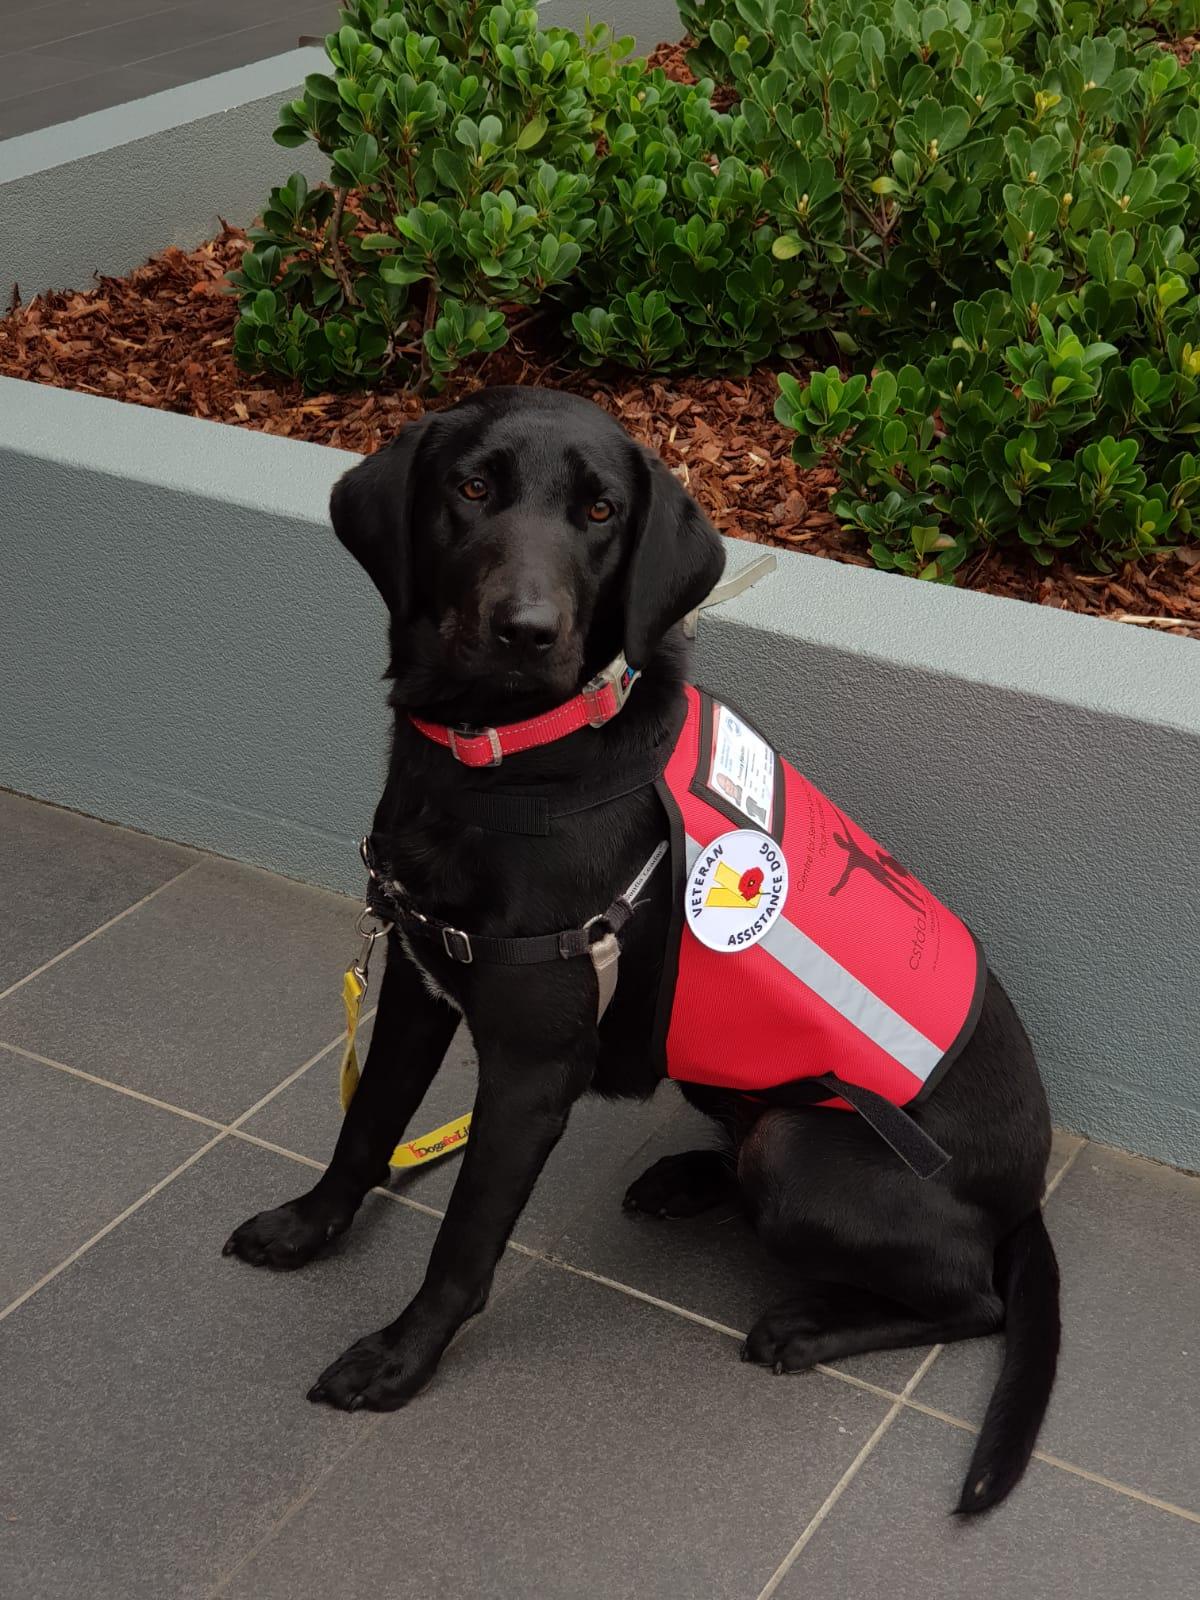 Dogs for Life trained DVA Psychiatric Assistance Dog, Koda